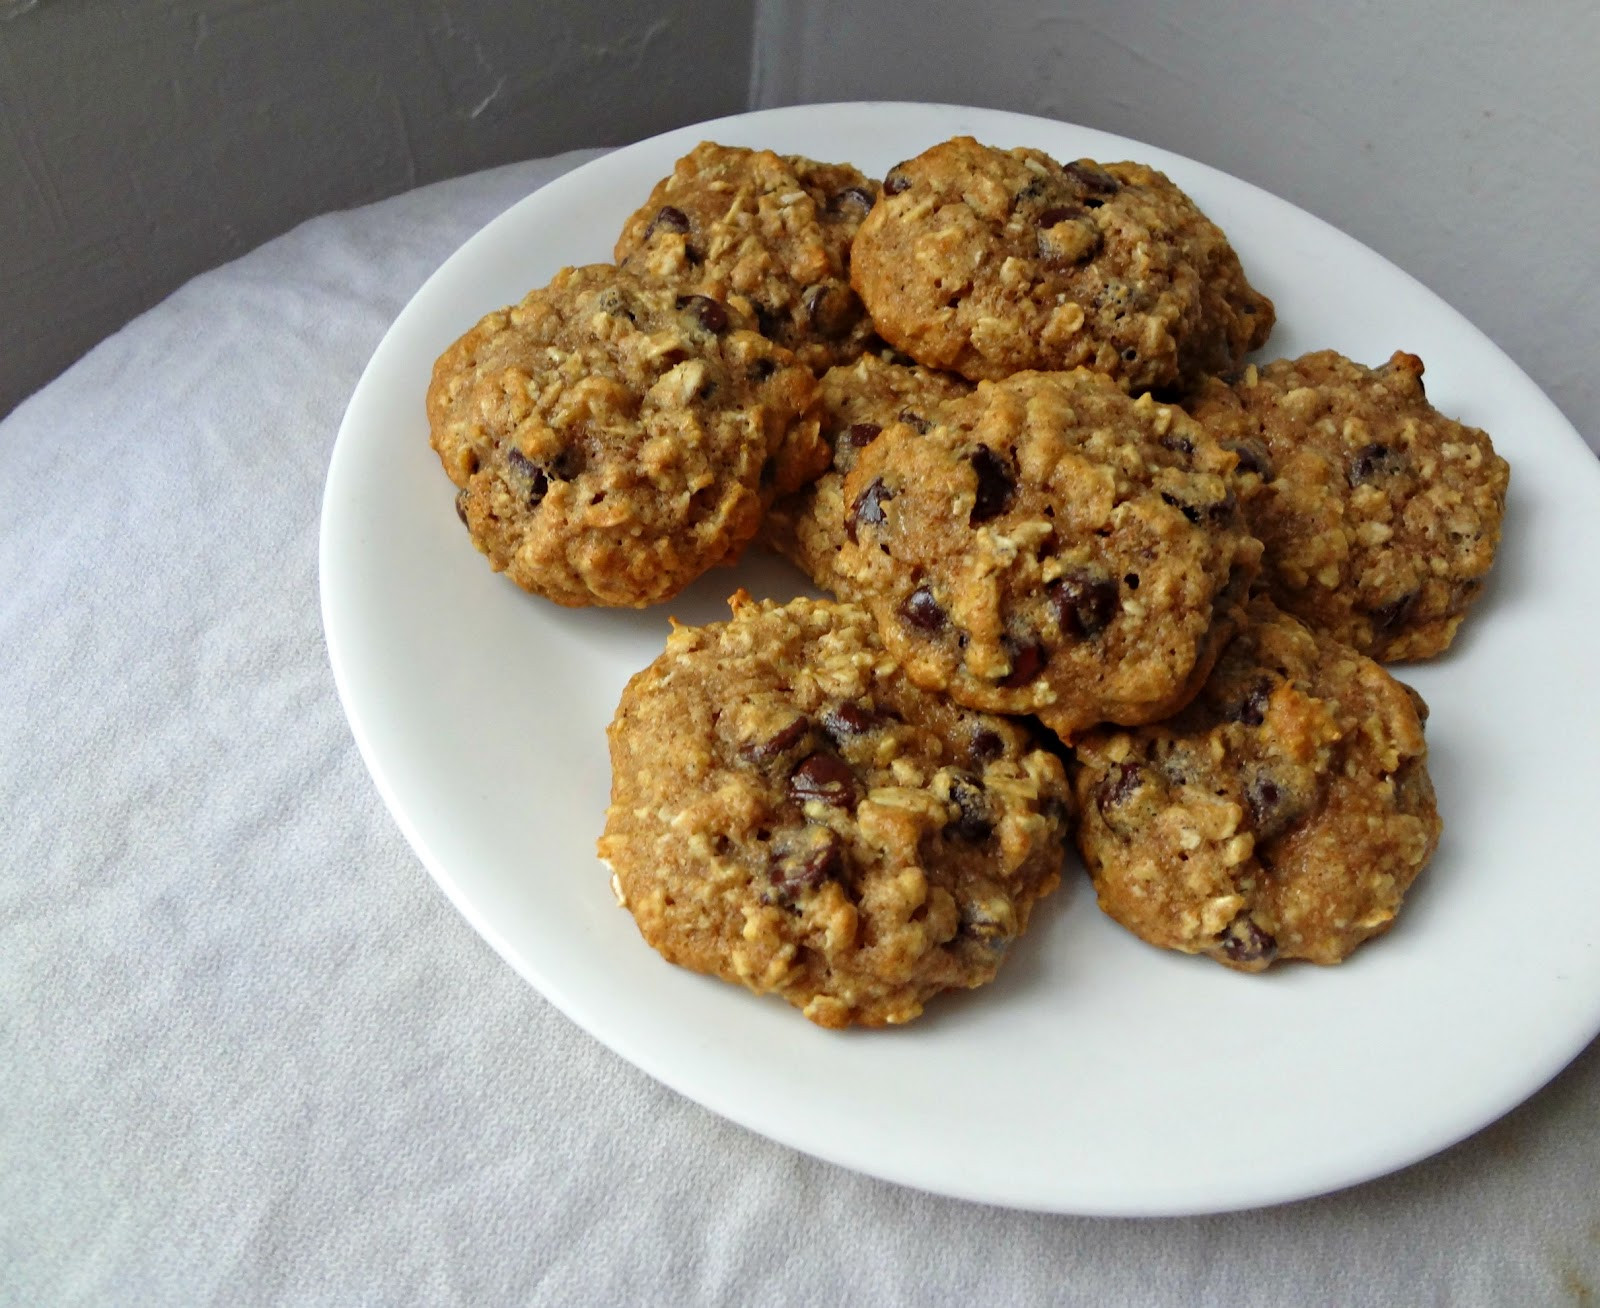 Healthy Oatmeal Chocolate Chip Cookies Recipe  The Cooking Actress Healthy Oatmeal Chocolate Chip Cookies